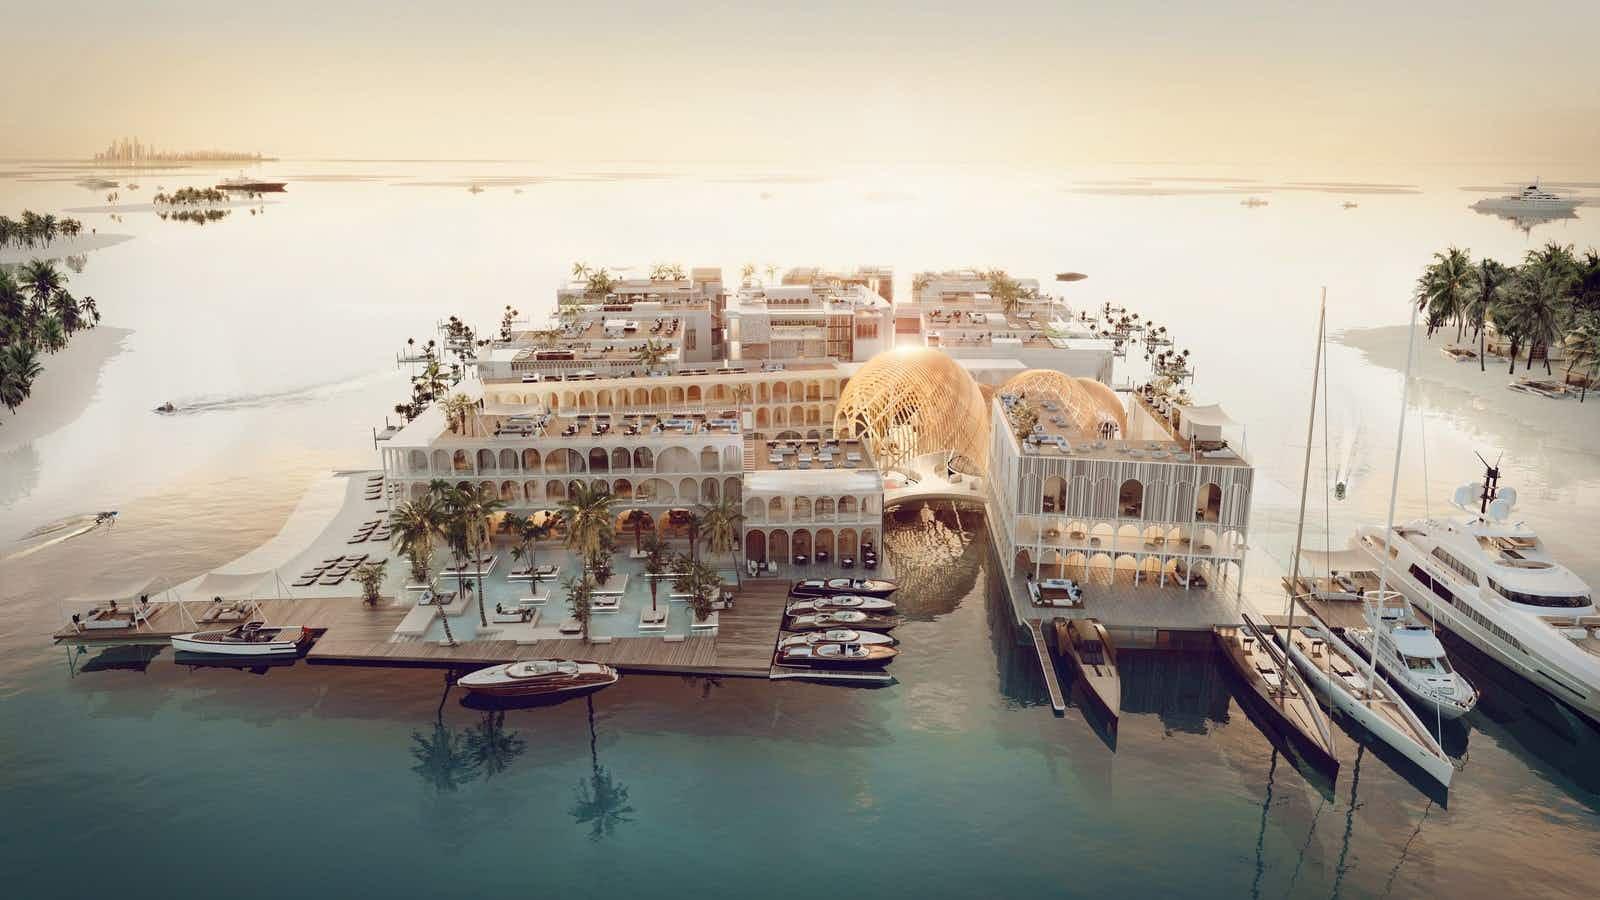 The world's first underwater luxury vessel resort will be built in Dubai